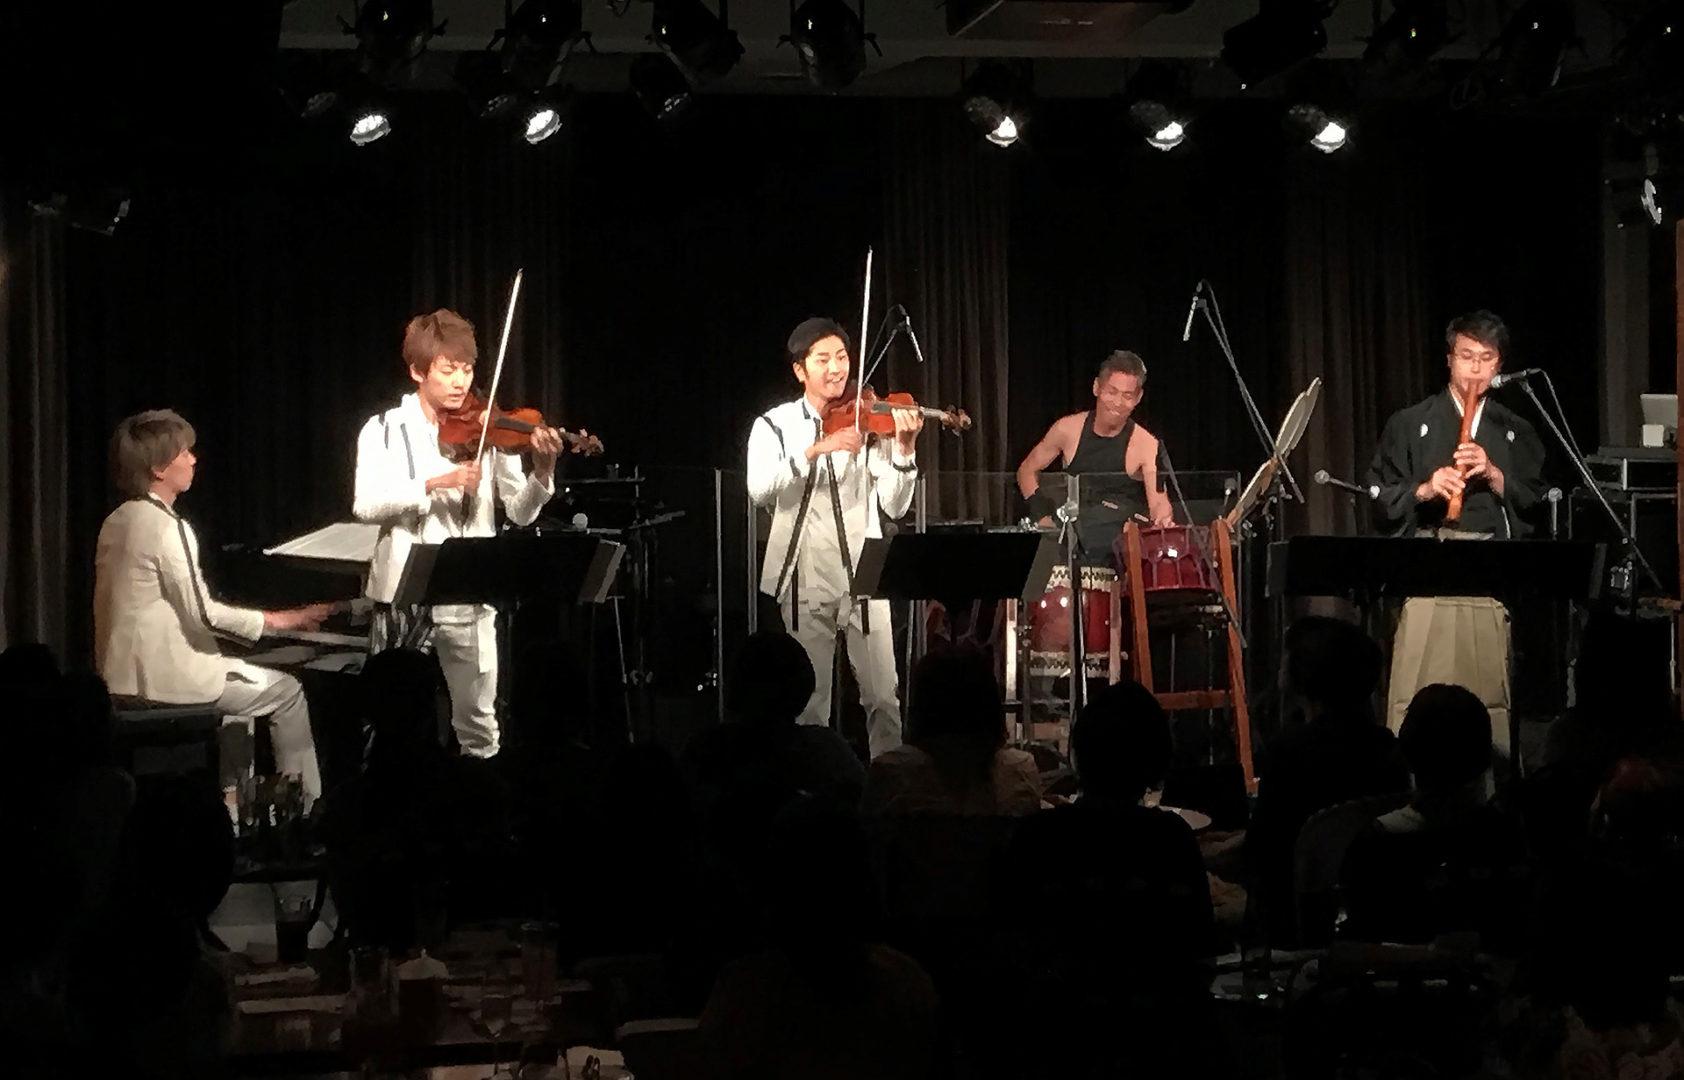 Masaki Otawa 大多和正樹 (Japanese taiko player - 和太鼓奏者) [Daikoku-TSUKEMEN_2019_2] 大黒 TSUKEMEN